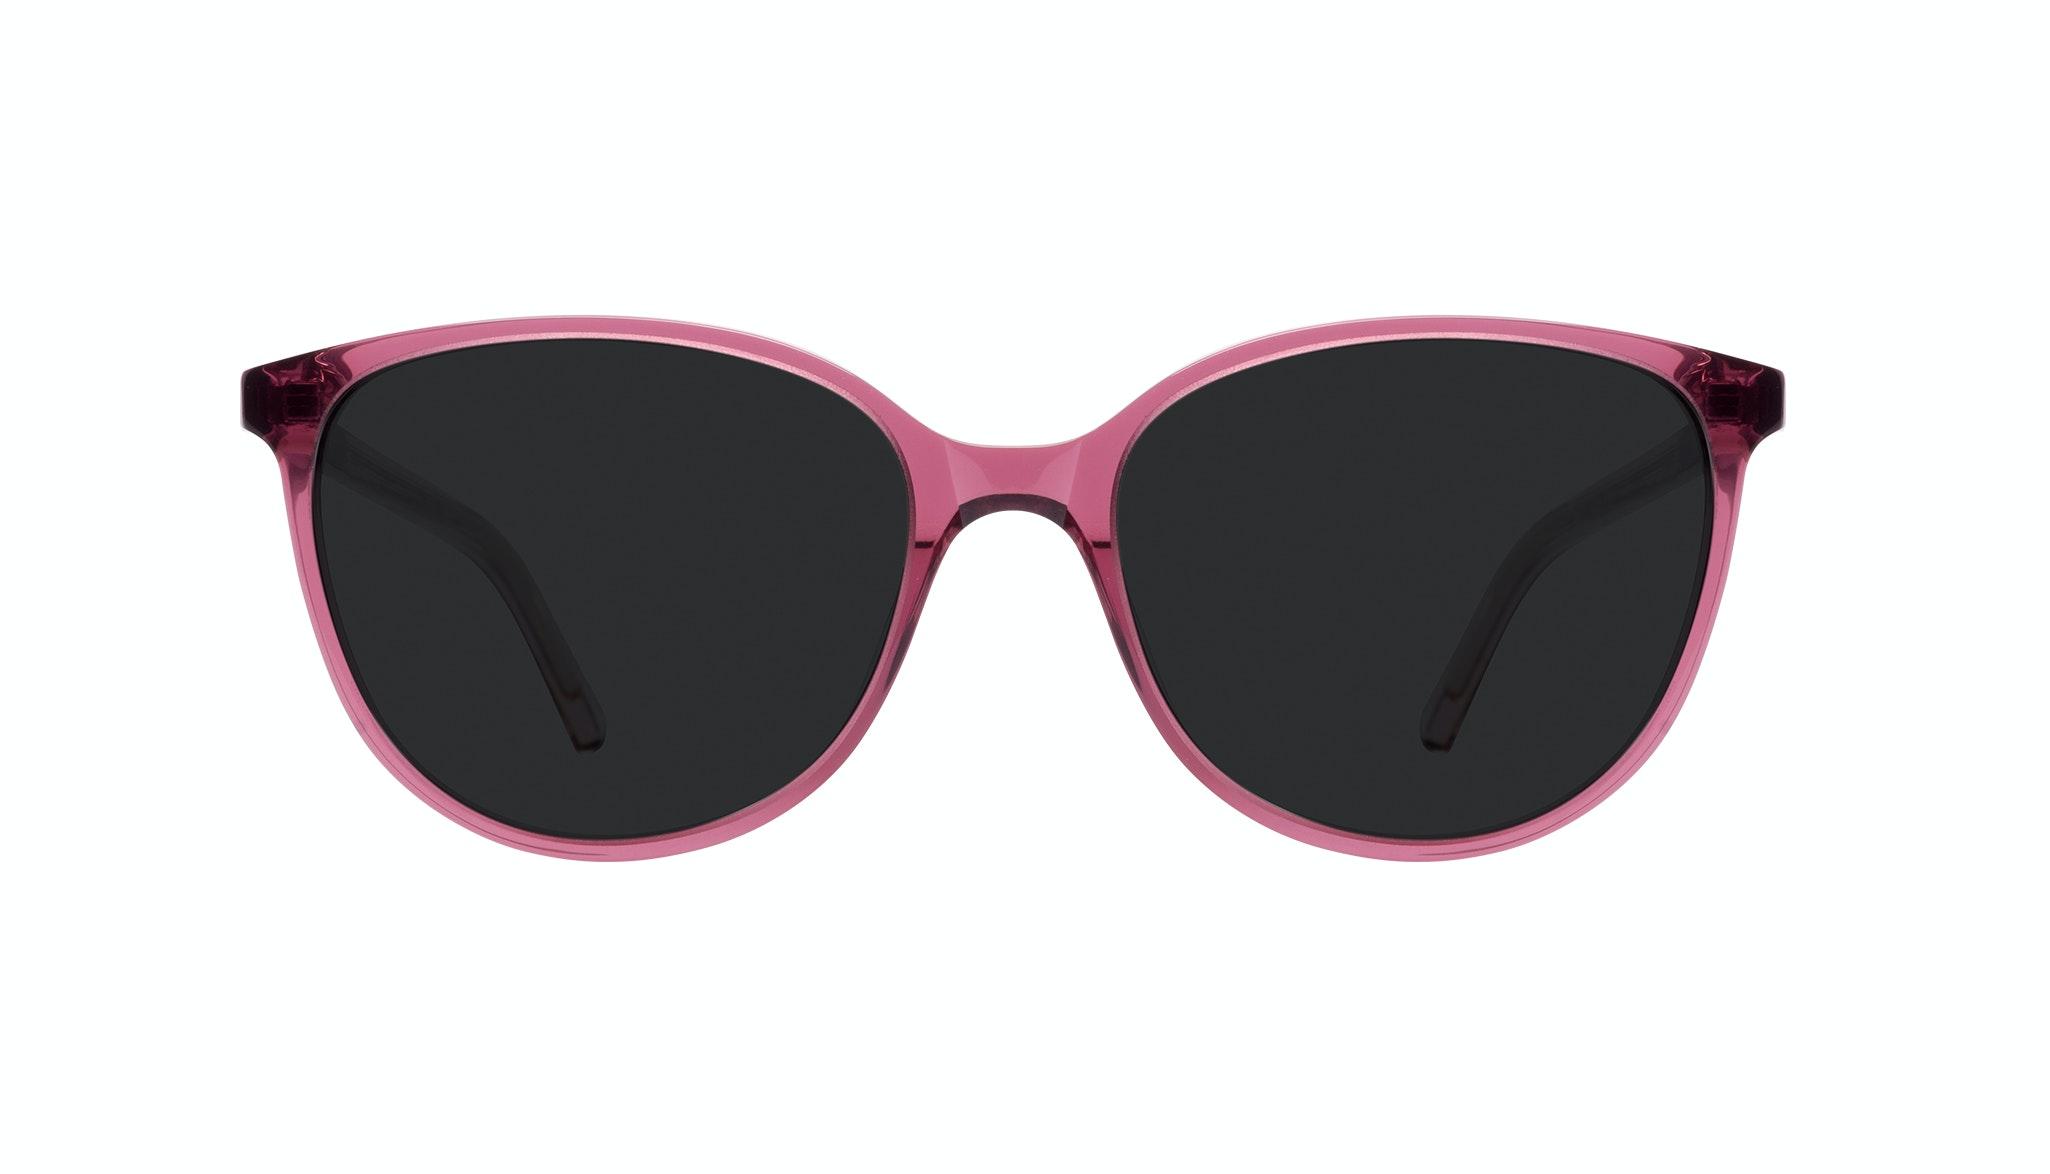 Affordable Fashion Glasses Round Sunglasses Women Imagine Petite Berry Front